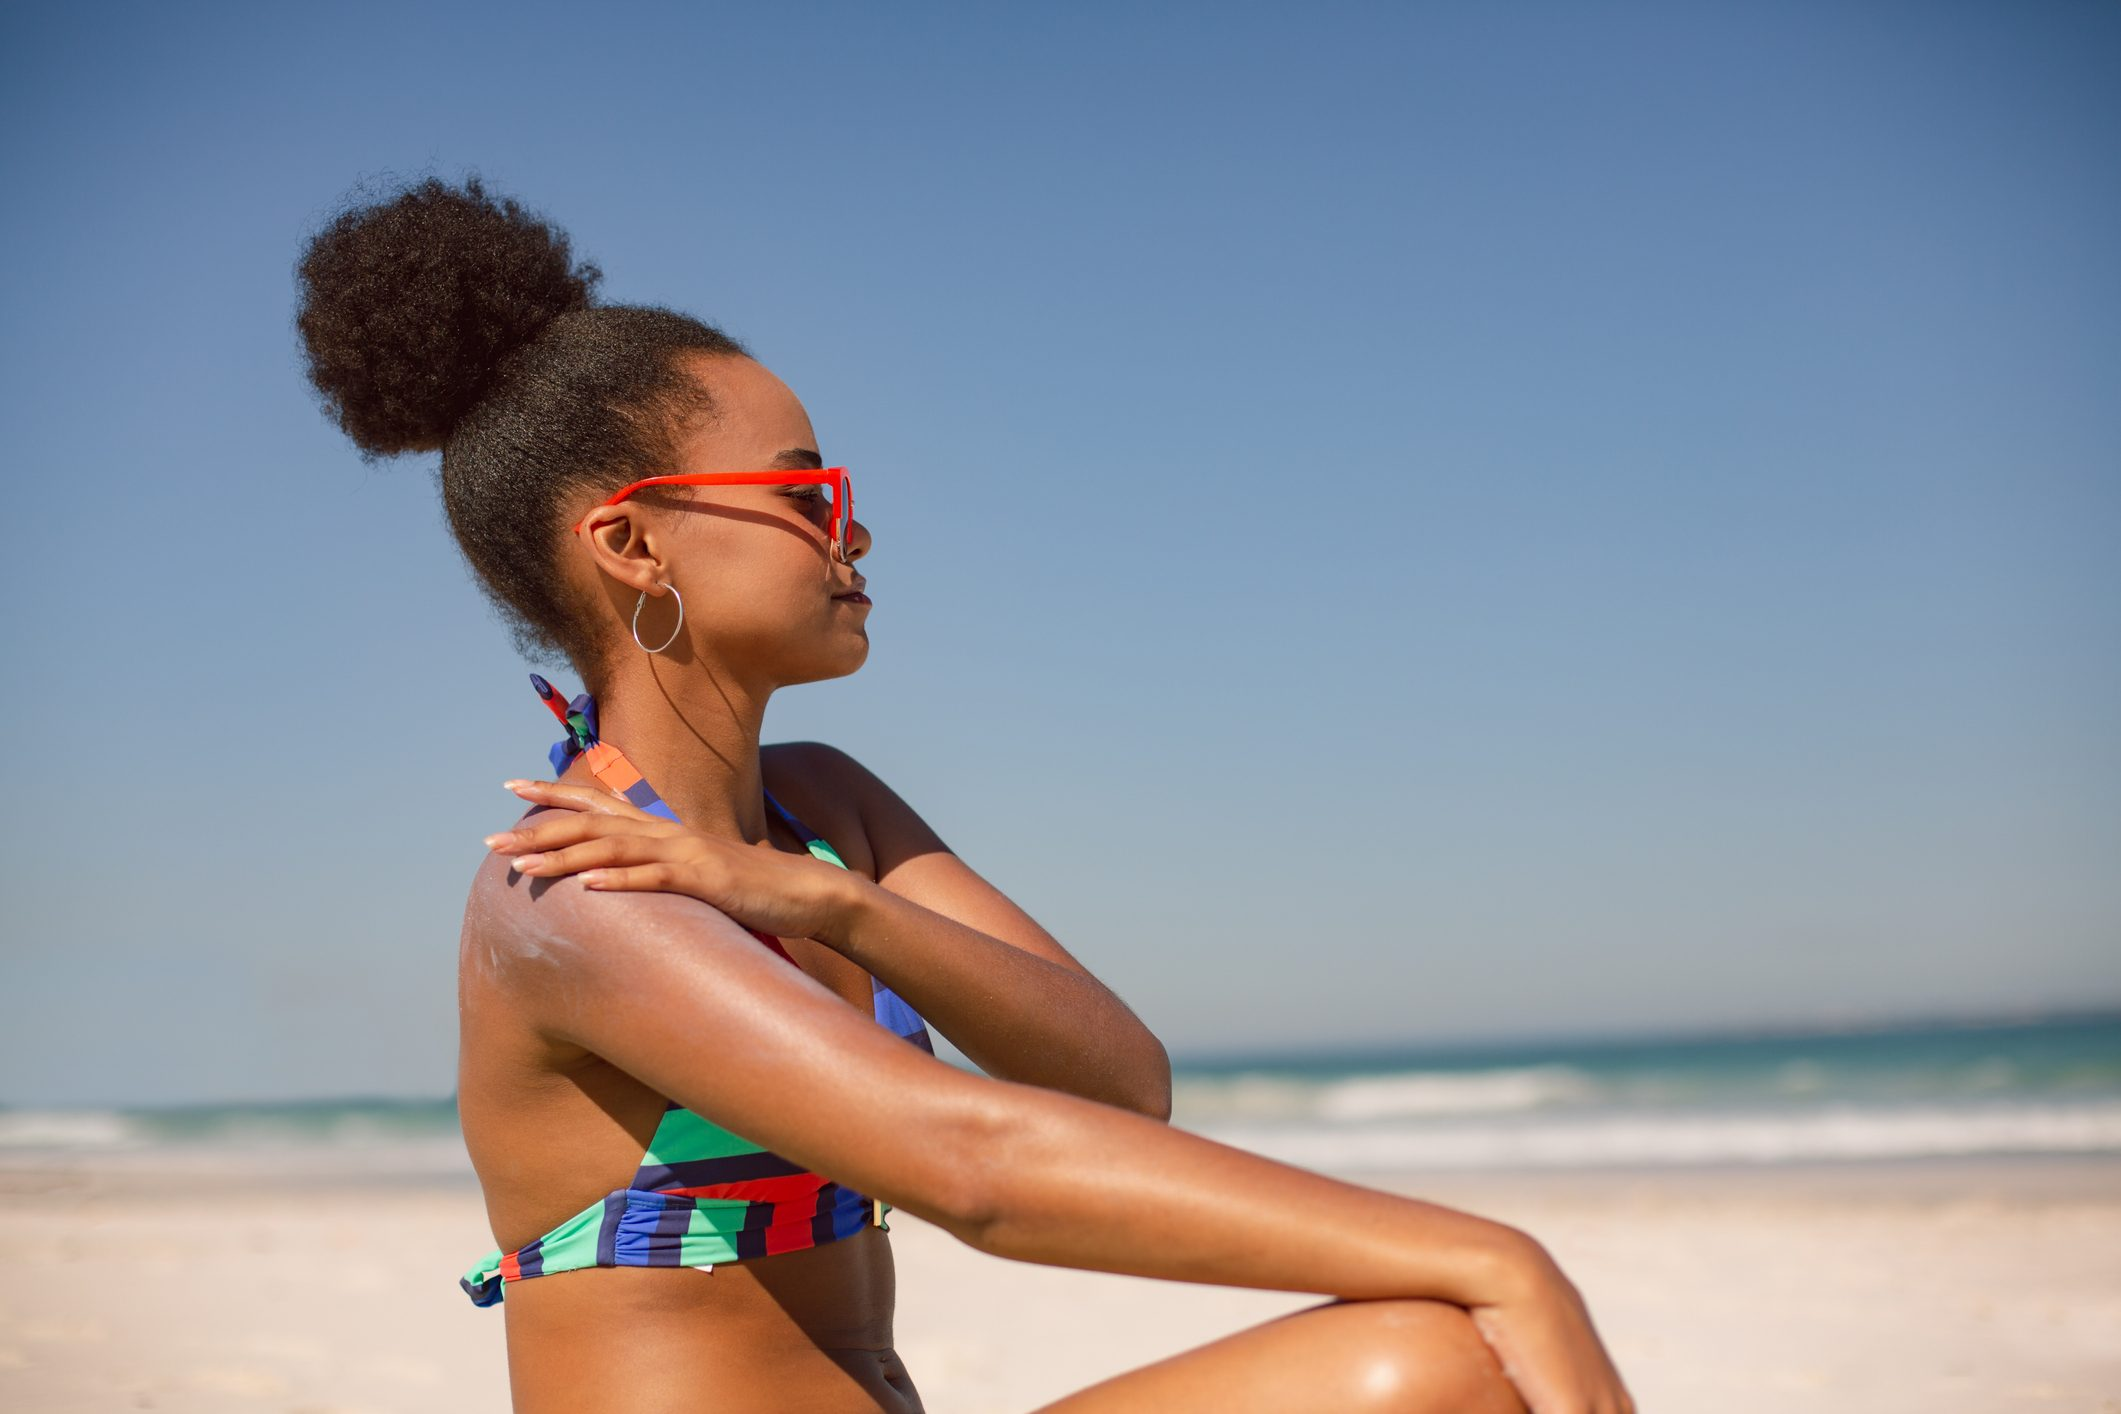 woman sitting on the beach applying sunscreen